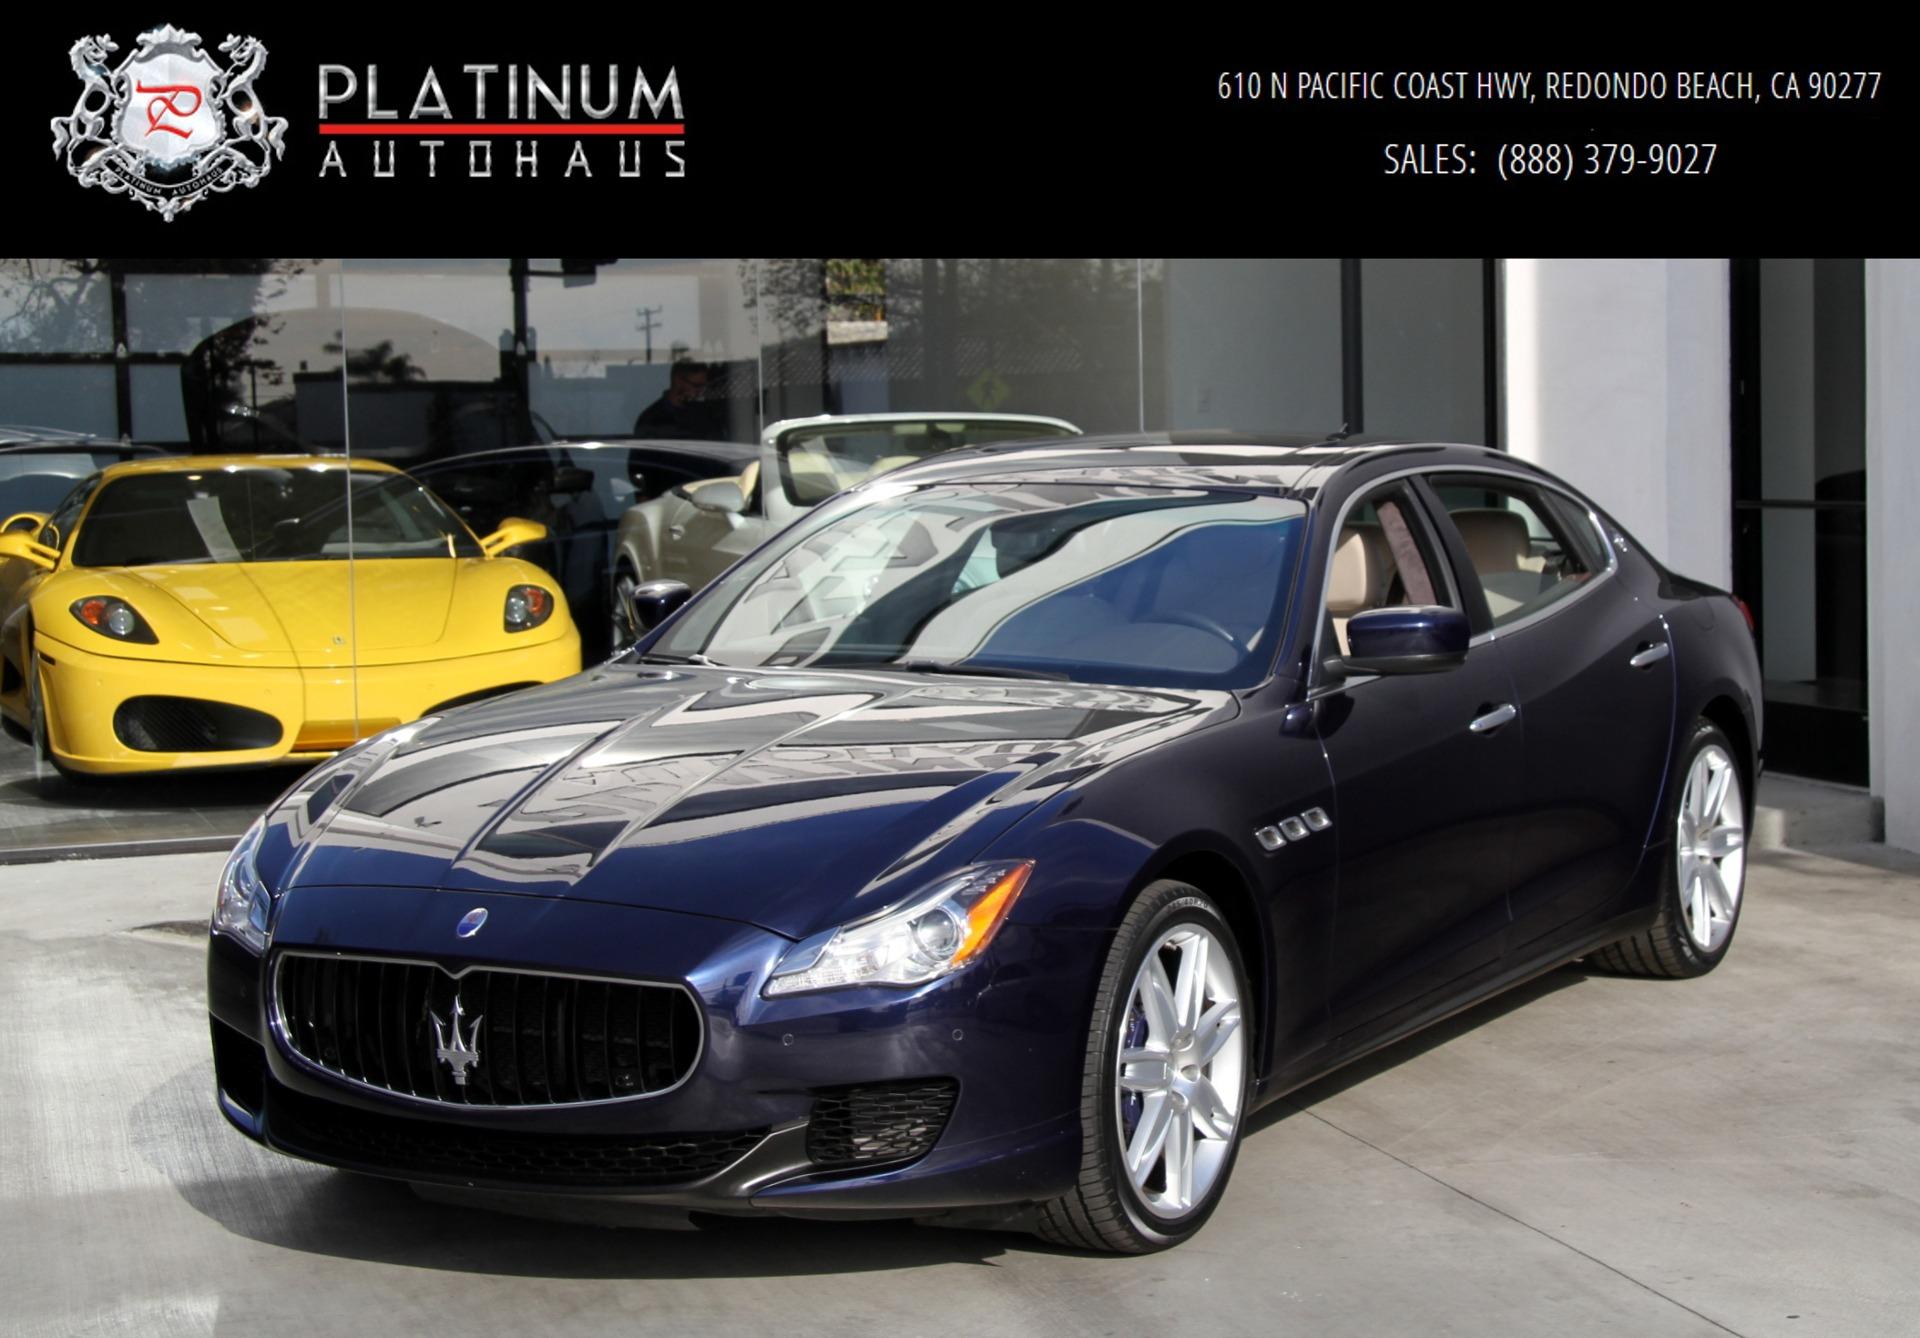 https://www.platinumautohaus.com/galleria_images/12630/12630_main_l.jpg